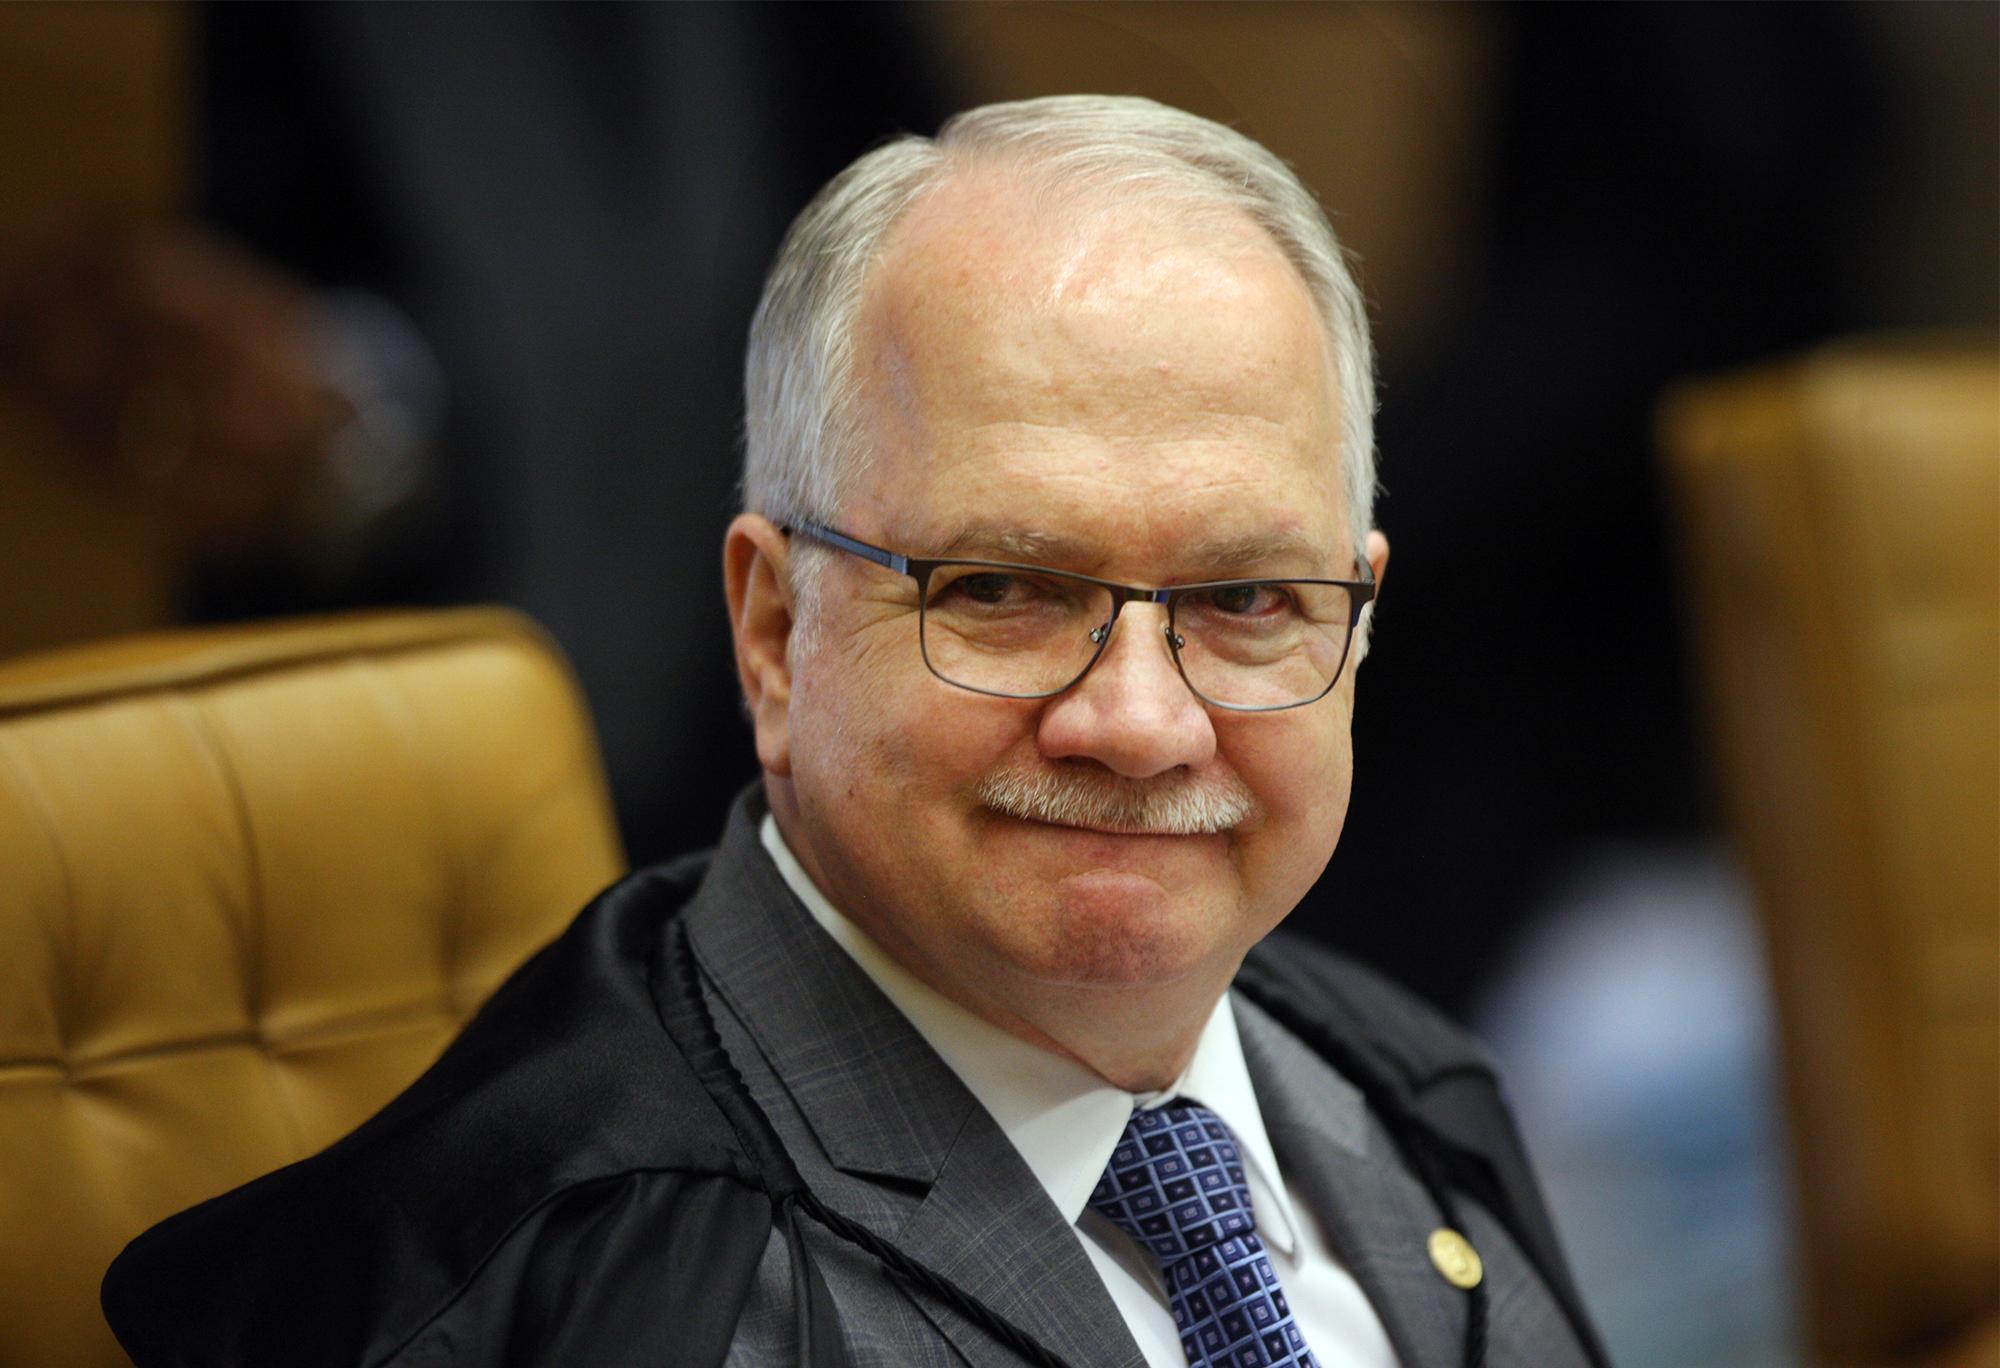 O ministro Edson Fachin: toca o habeas corpus pro pai. Foto: Nelson Jr./SCO/STF